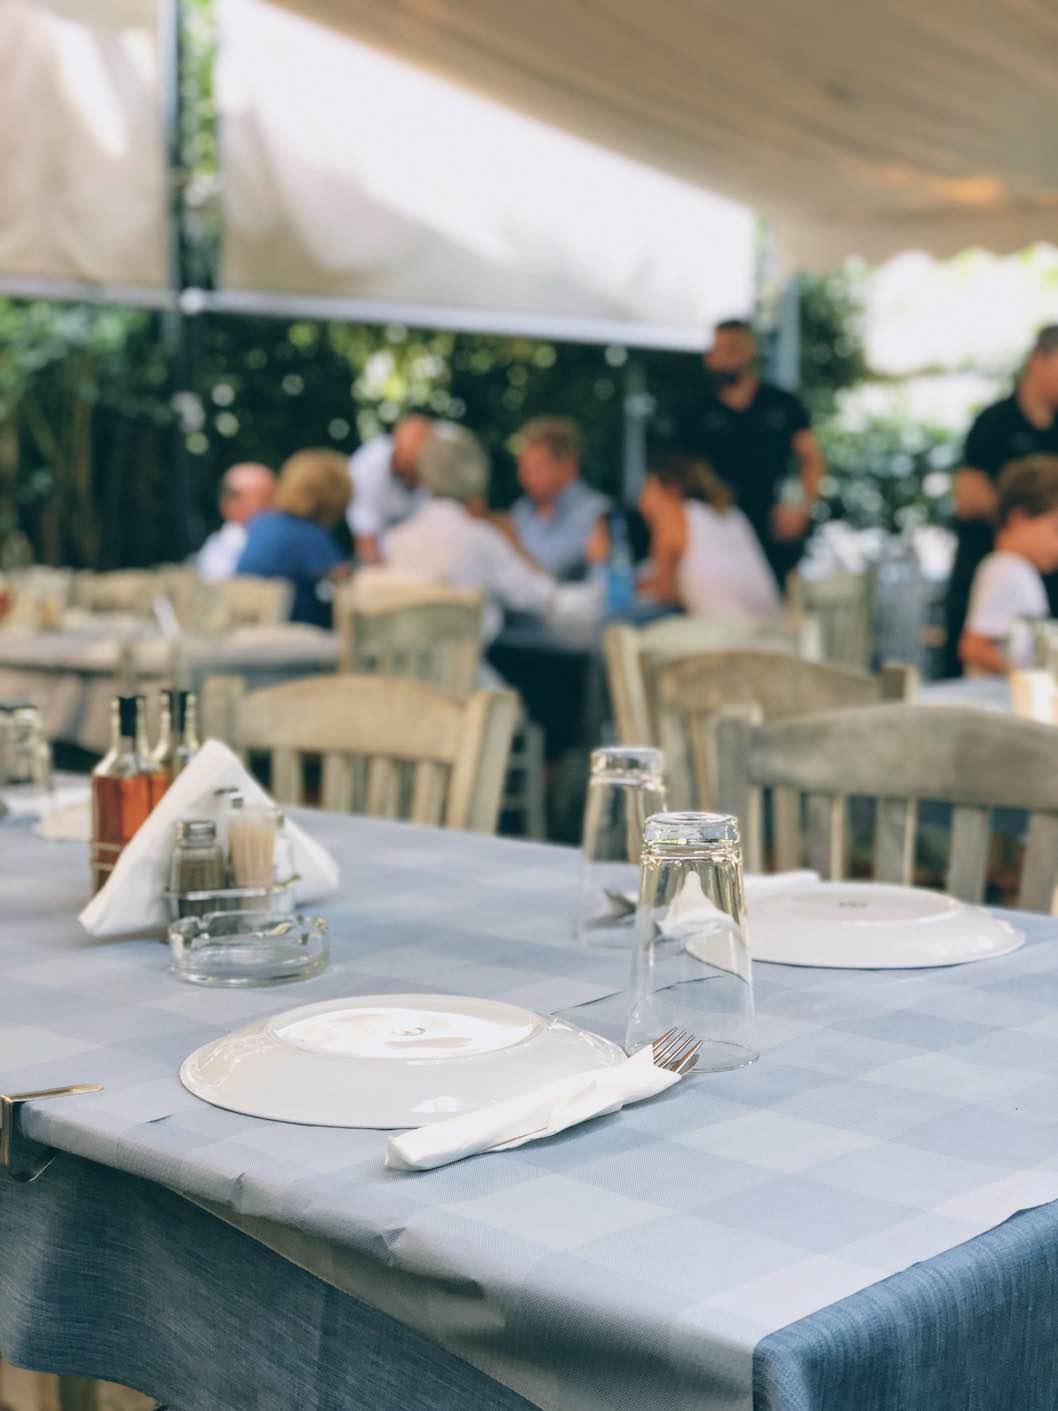 Paramalo, Athens - Travel Food People